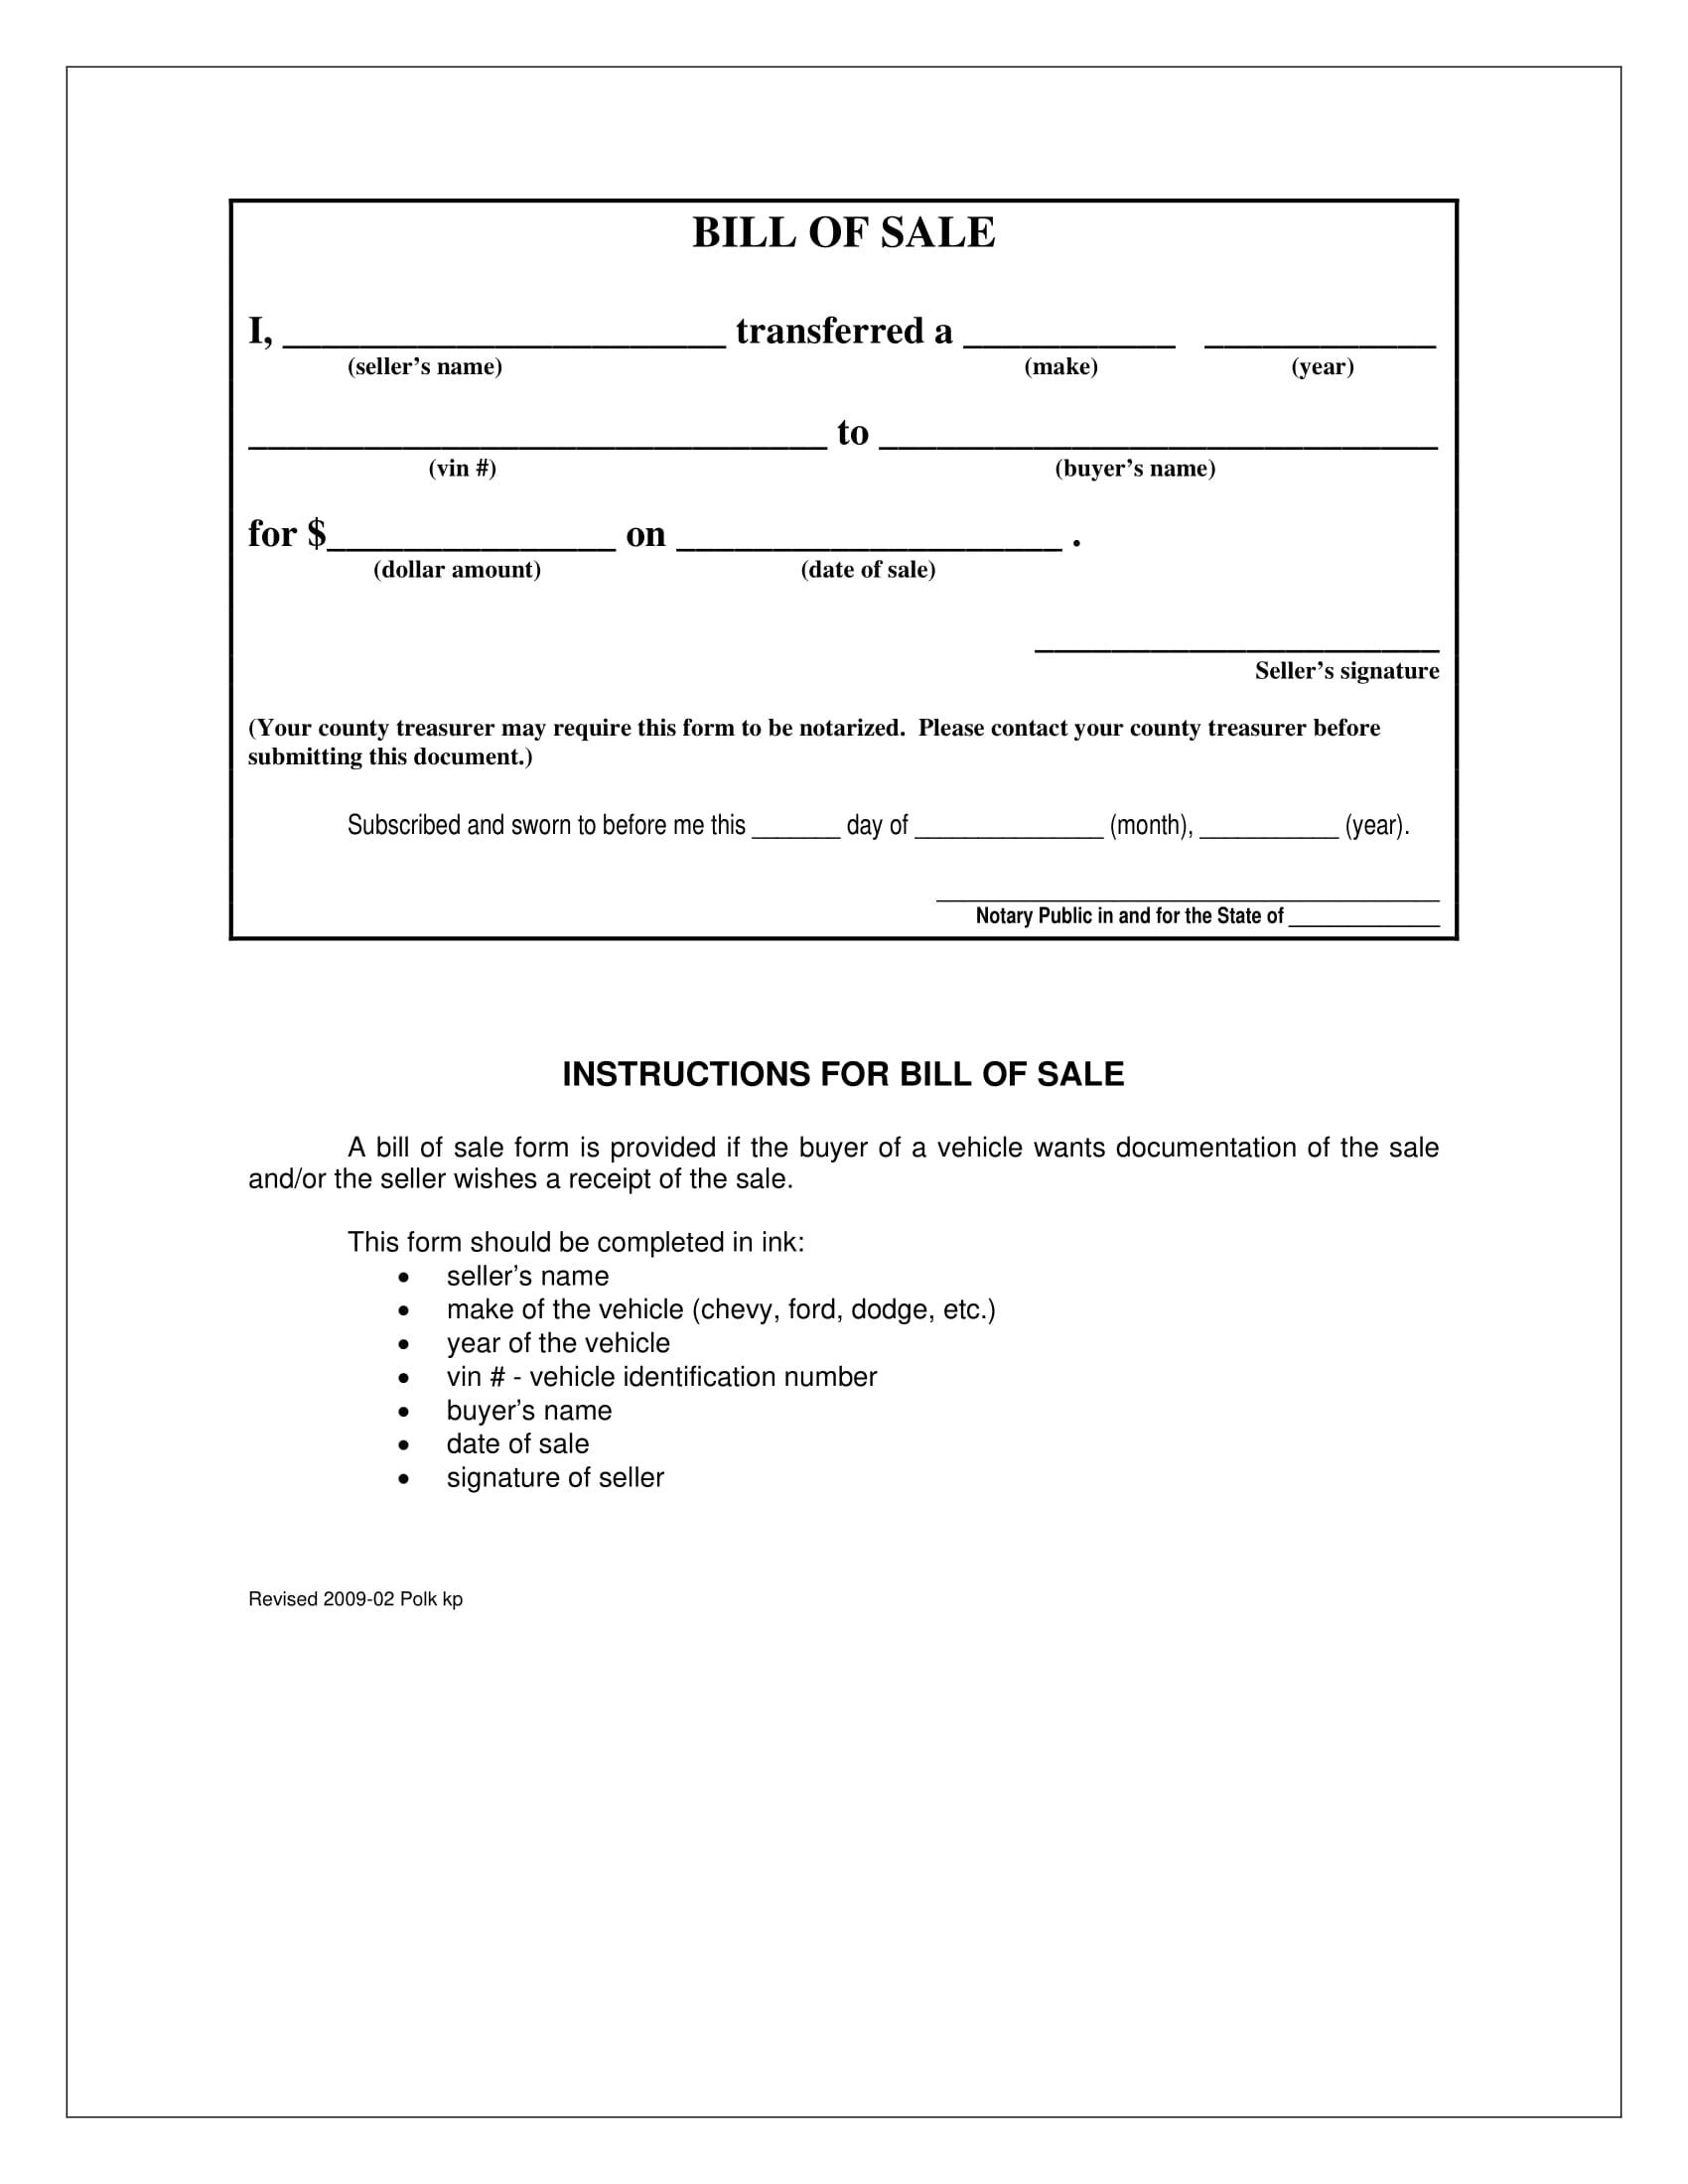 Iowa Motor Vehicle Bill of Sale Form Template PDF